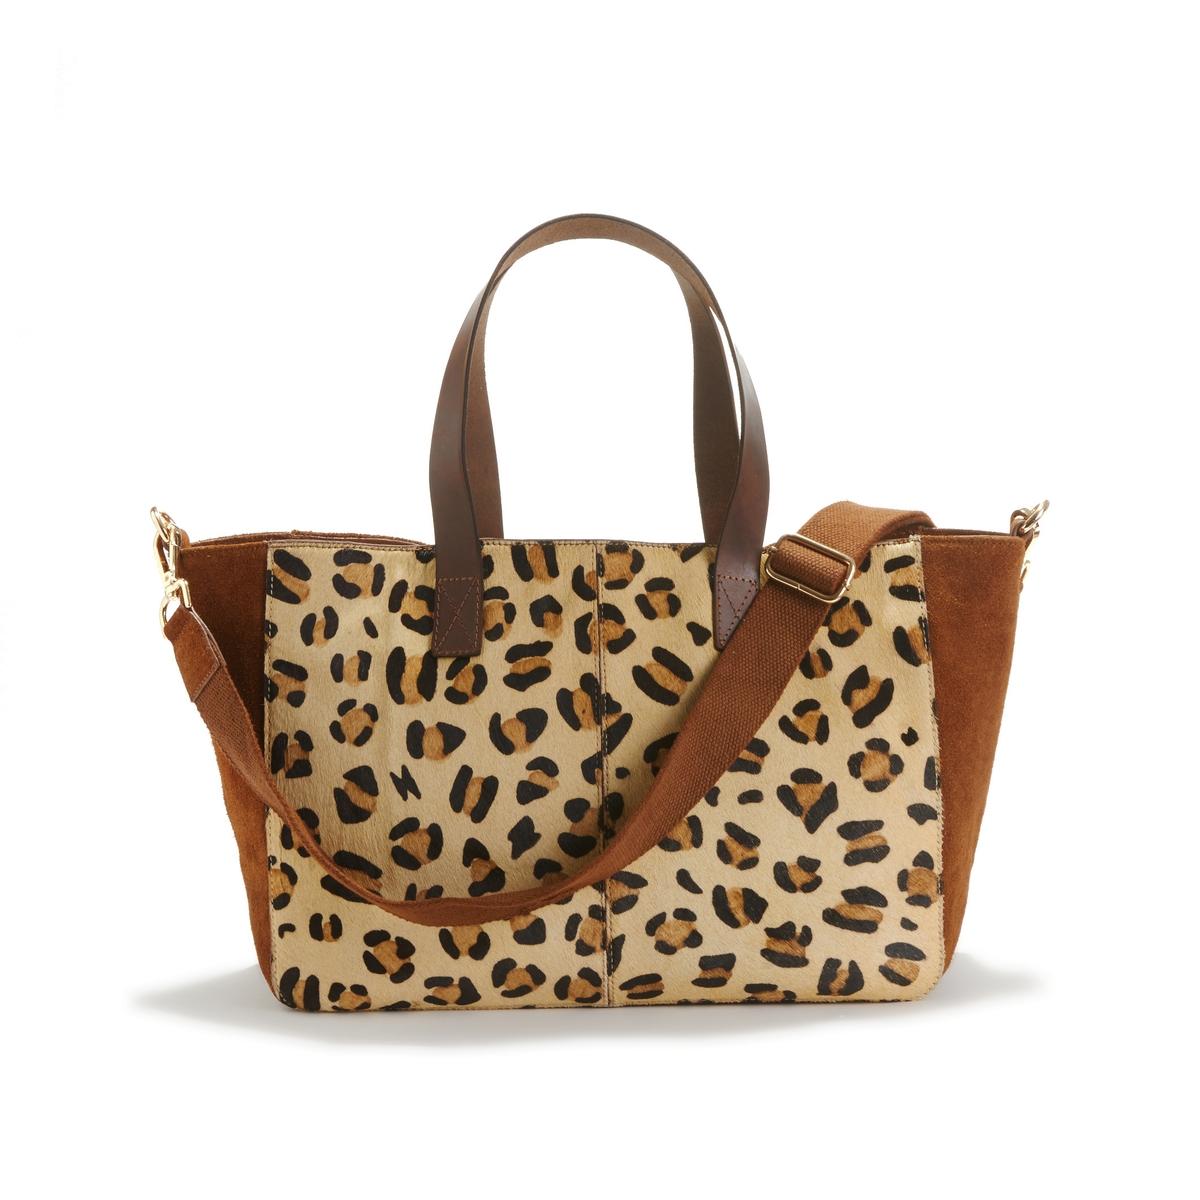 Bolso tote de piel con motivo leopardo